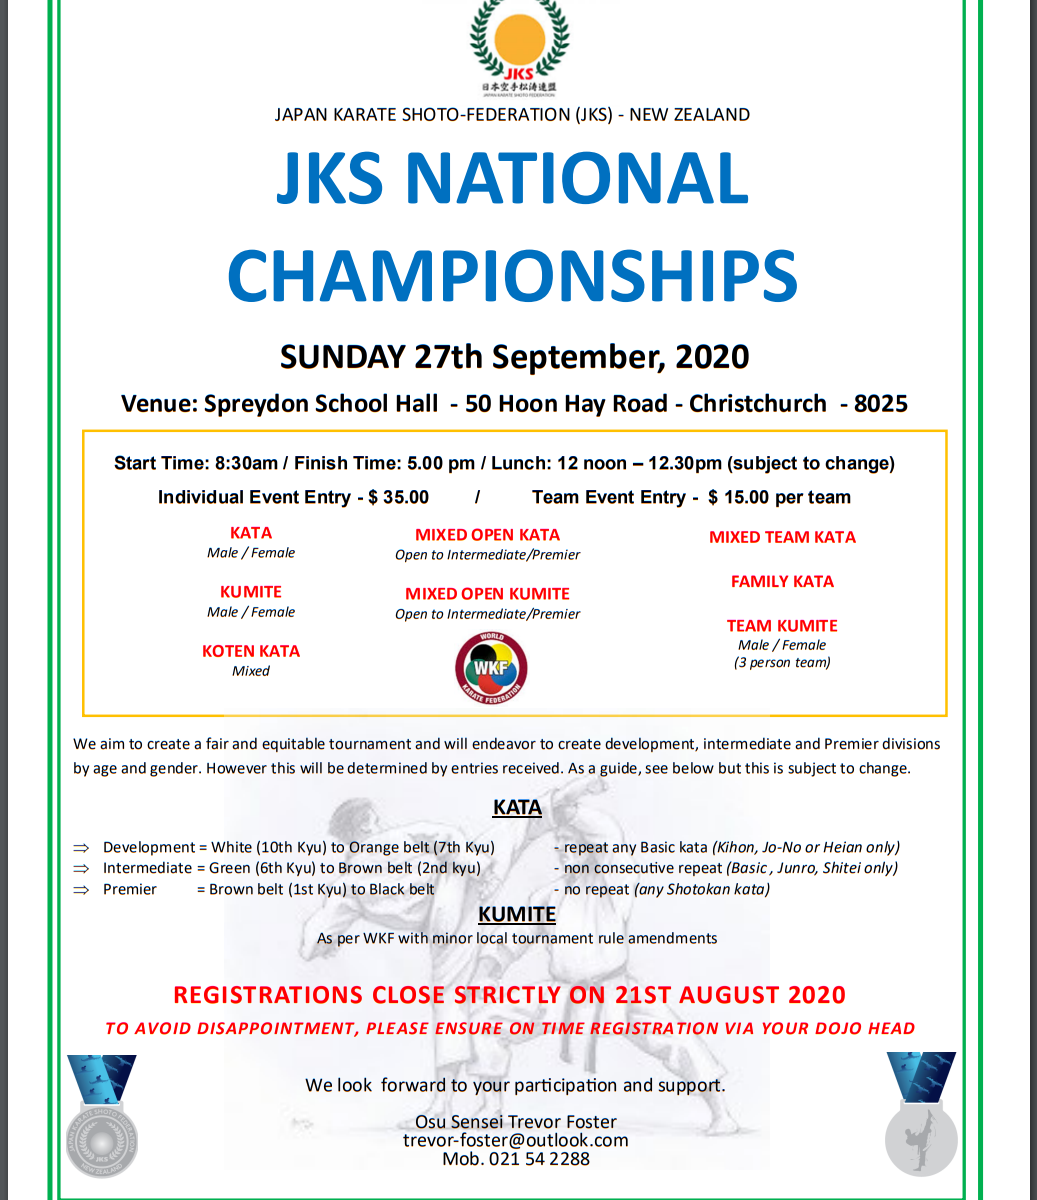 JKS National Championships